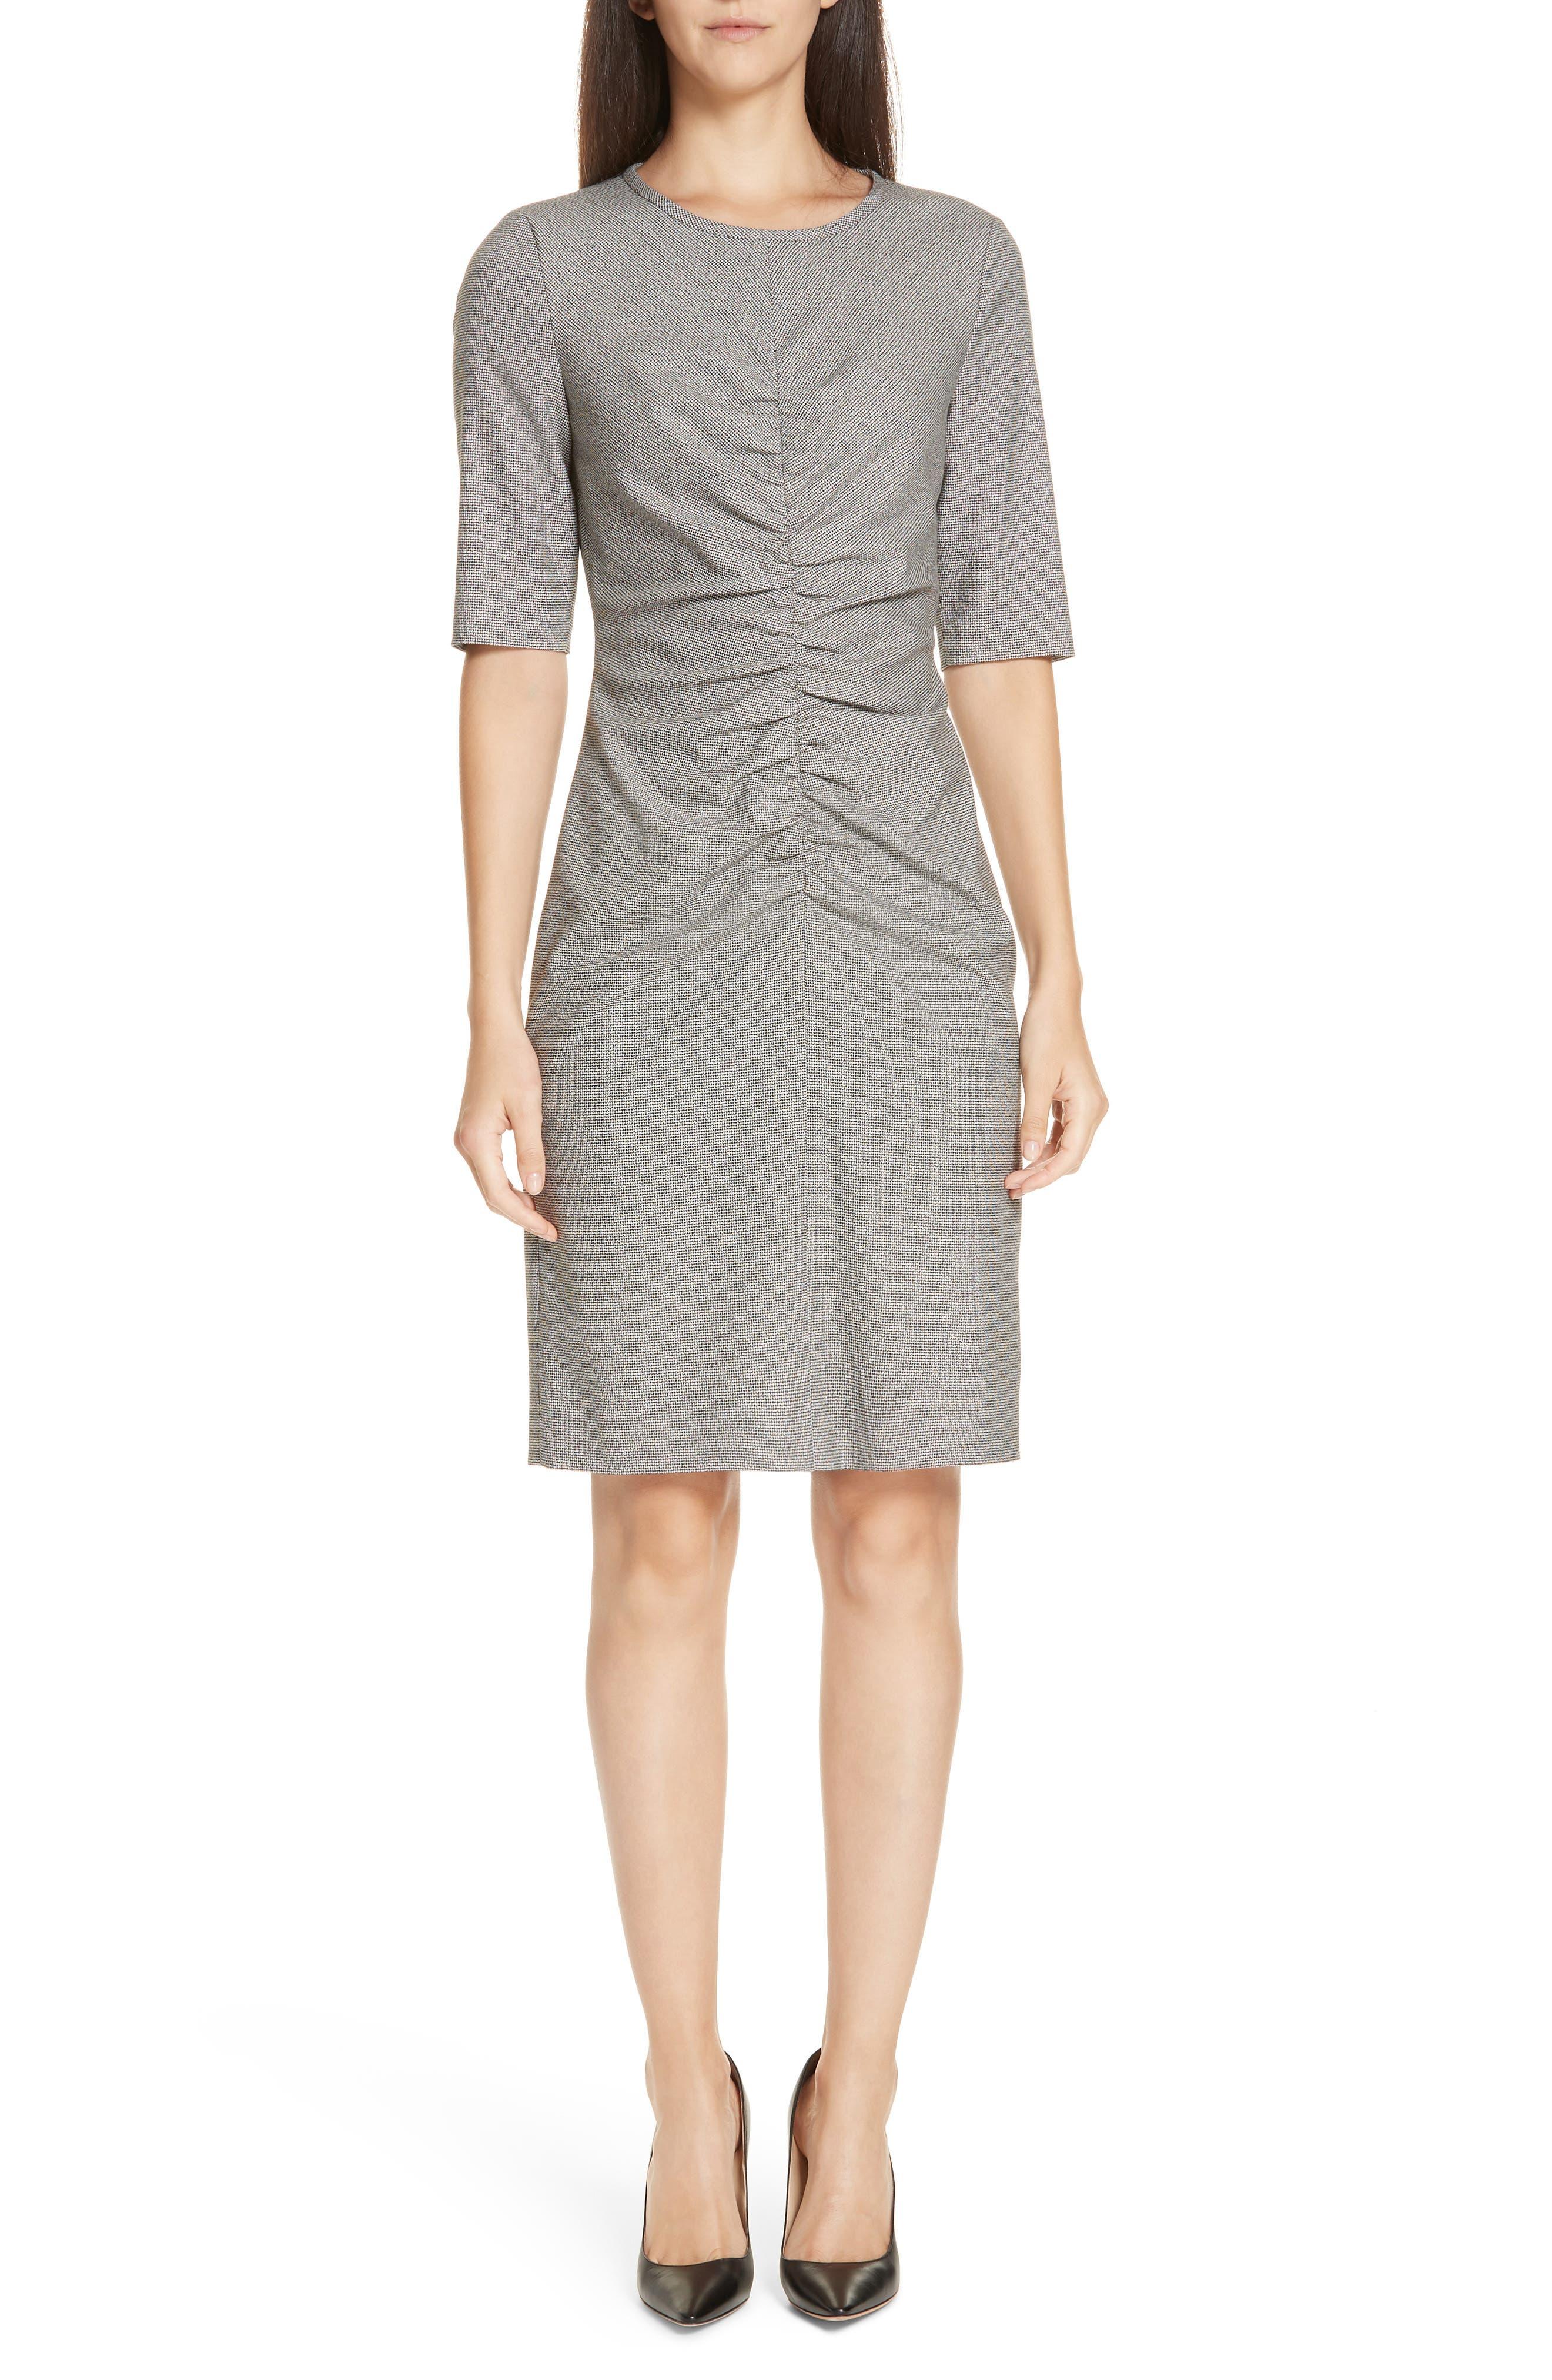 Dirafia Blurred Optic Dress,                             Main thumbnail 1, color,                             BLACK FANTASY